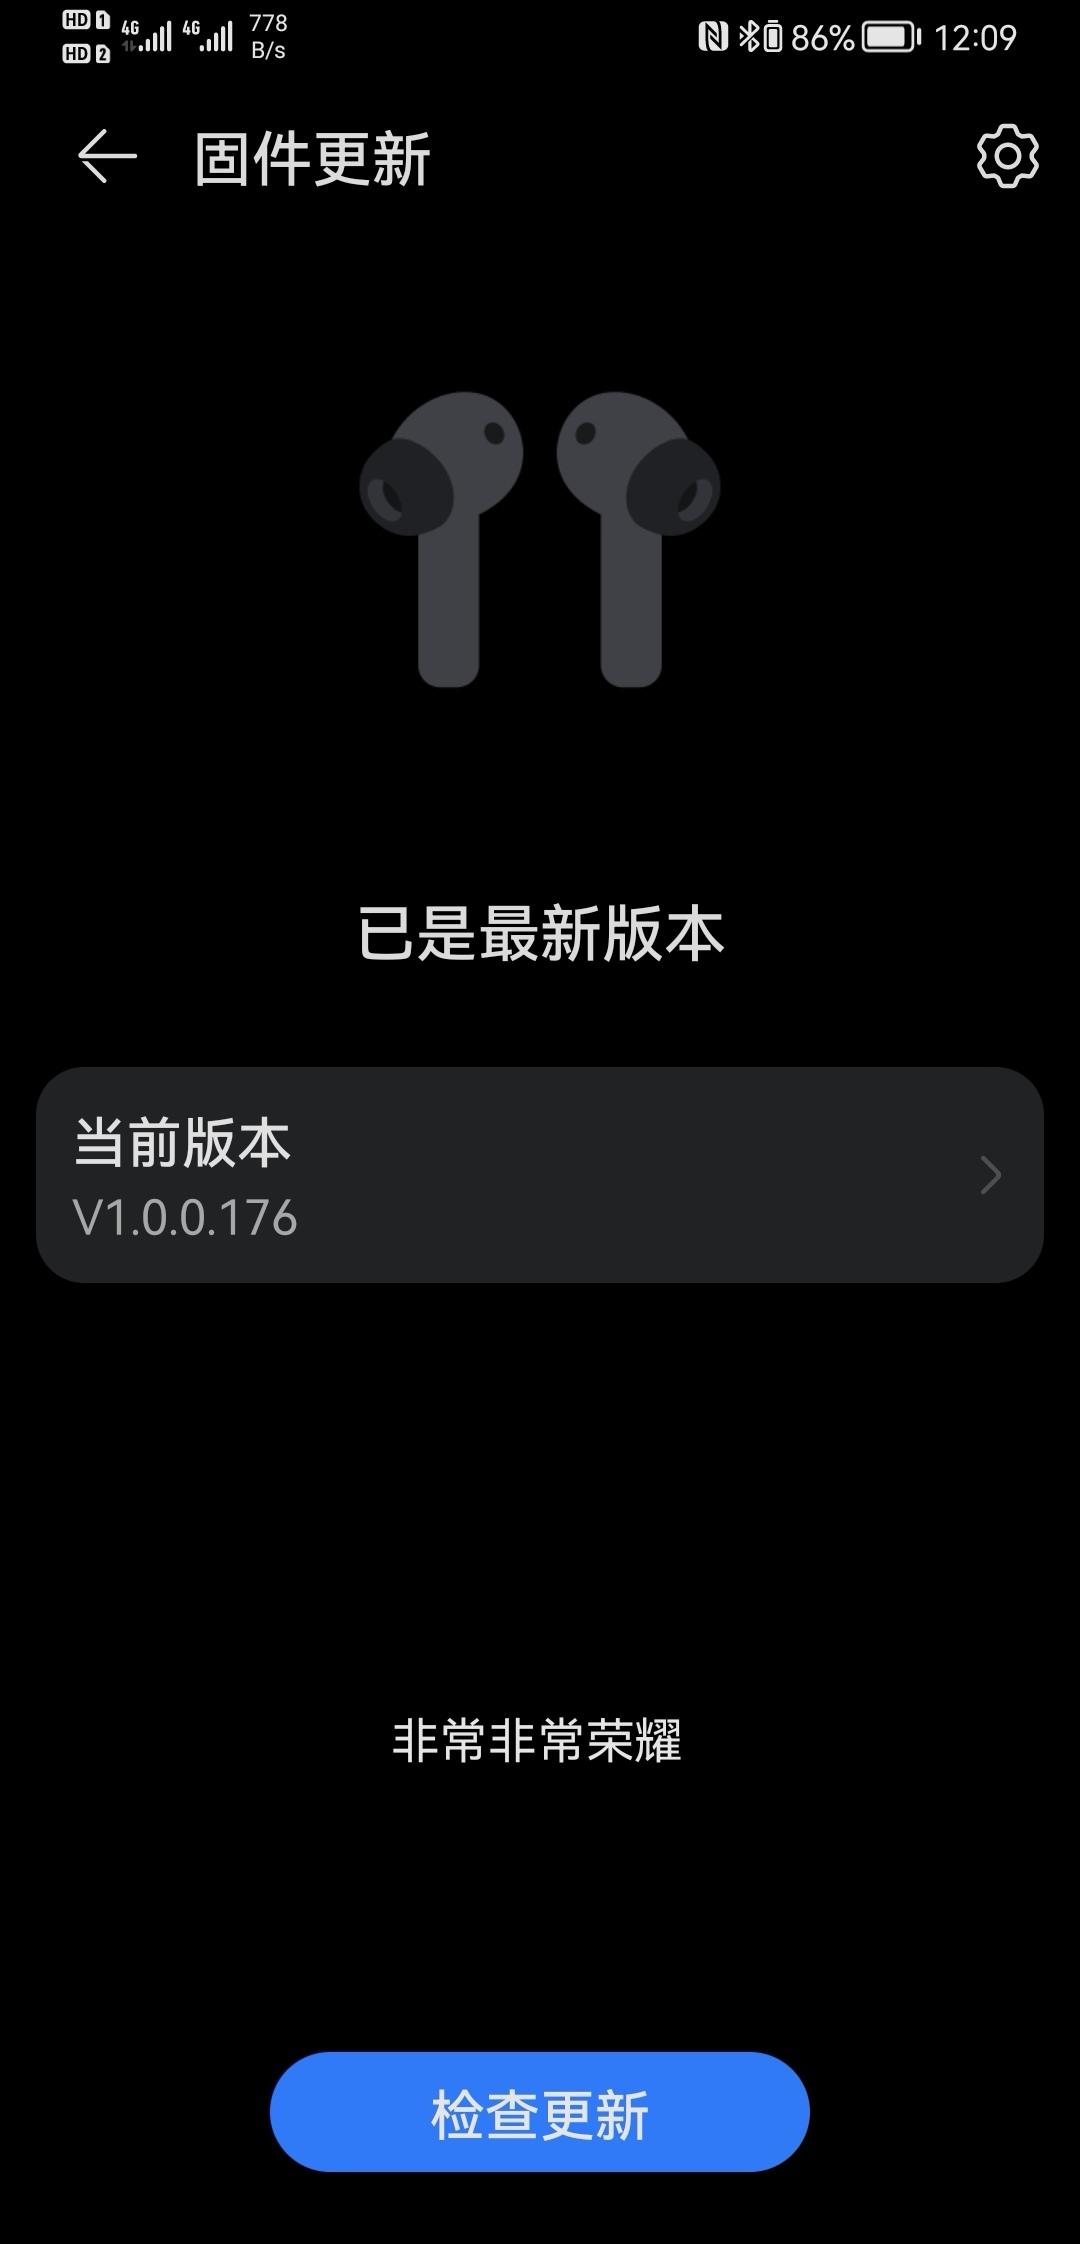 Screenshot_20210706_120922_com.huawei.smarthome_edit_40372809543317.jpg